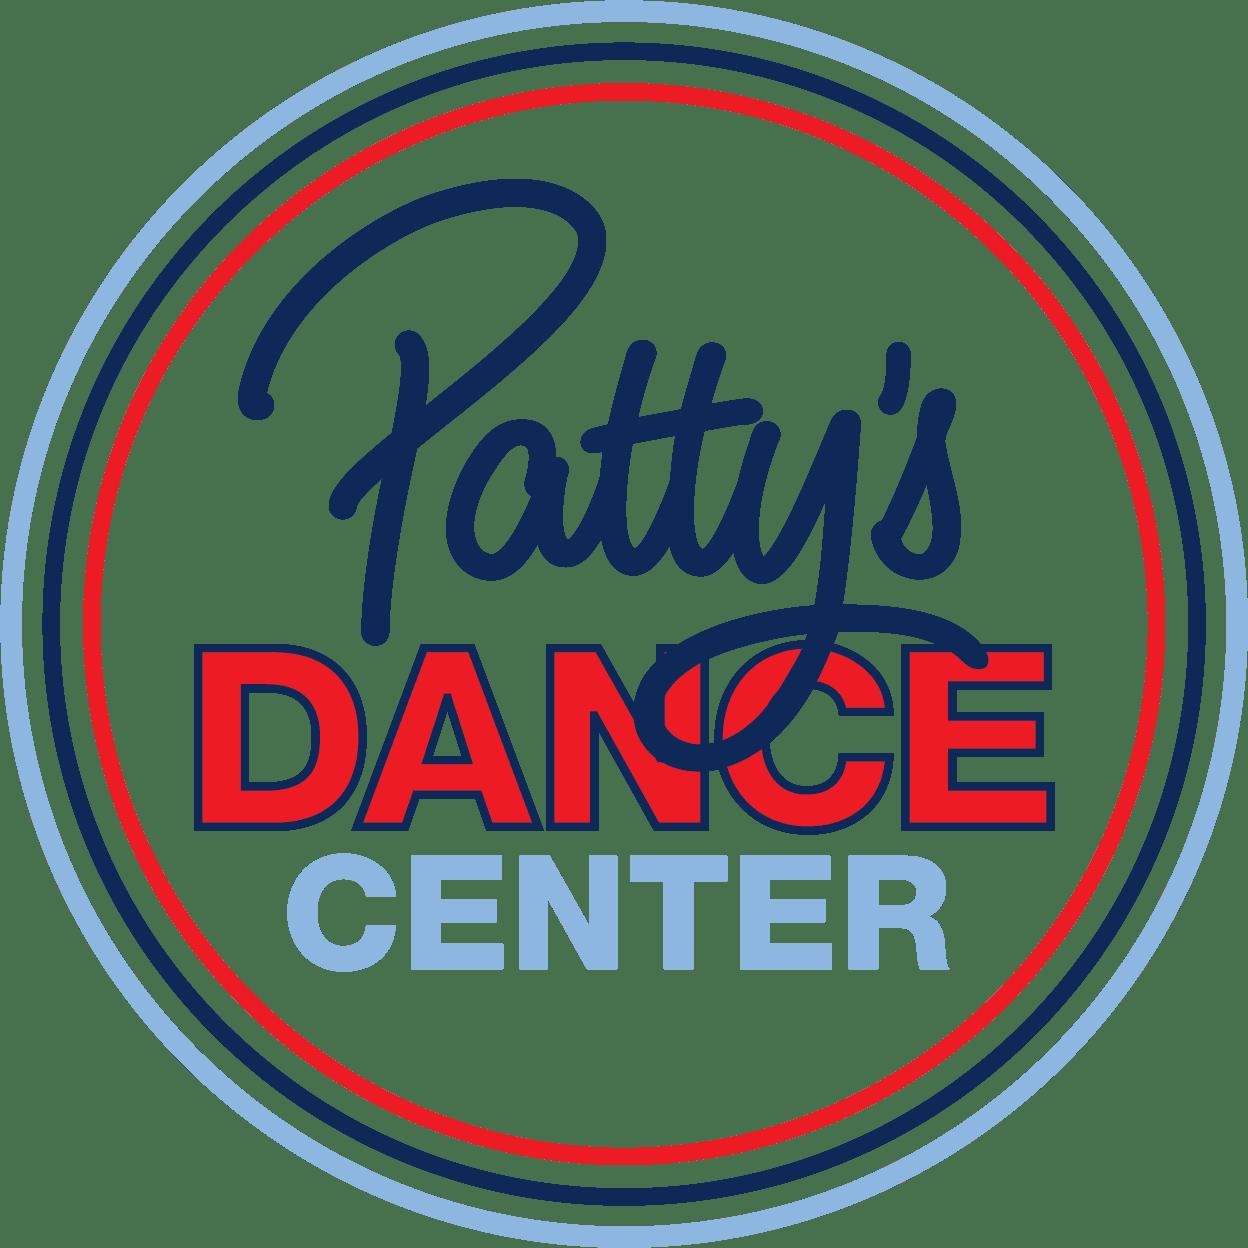 Patty's Dance Center